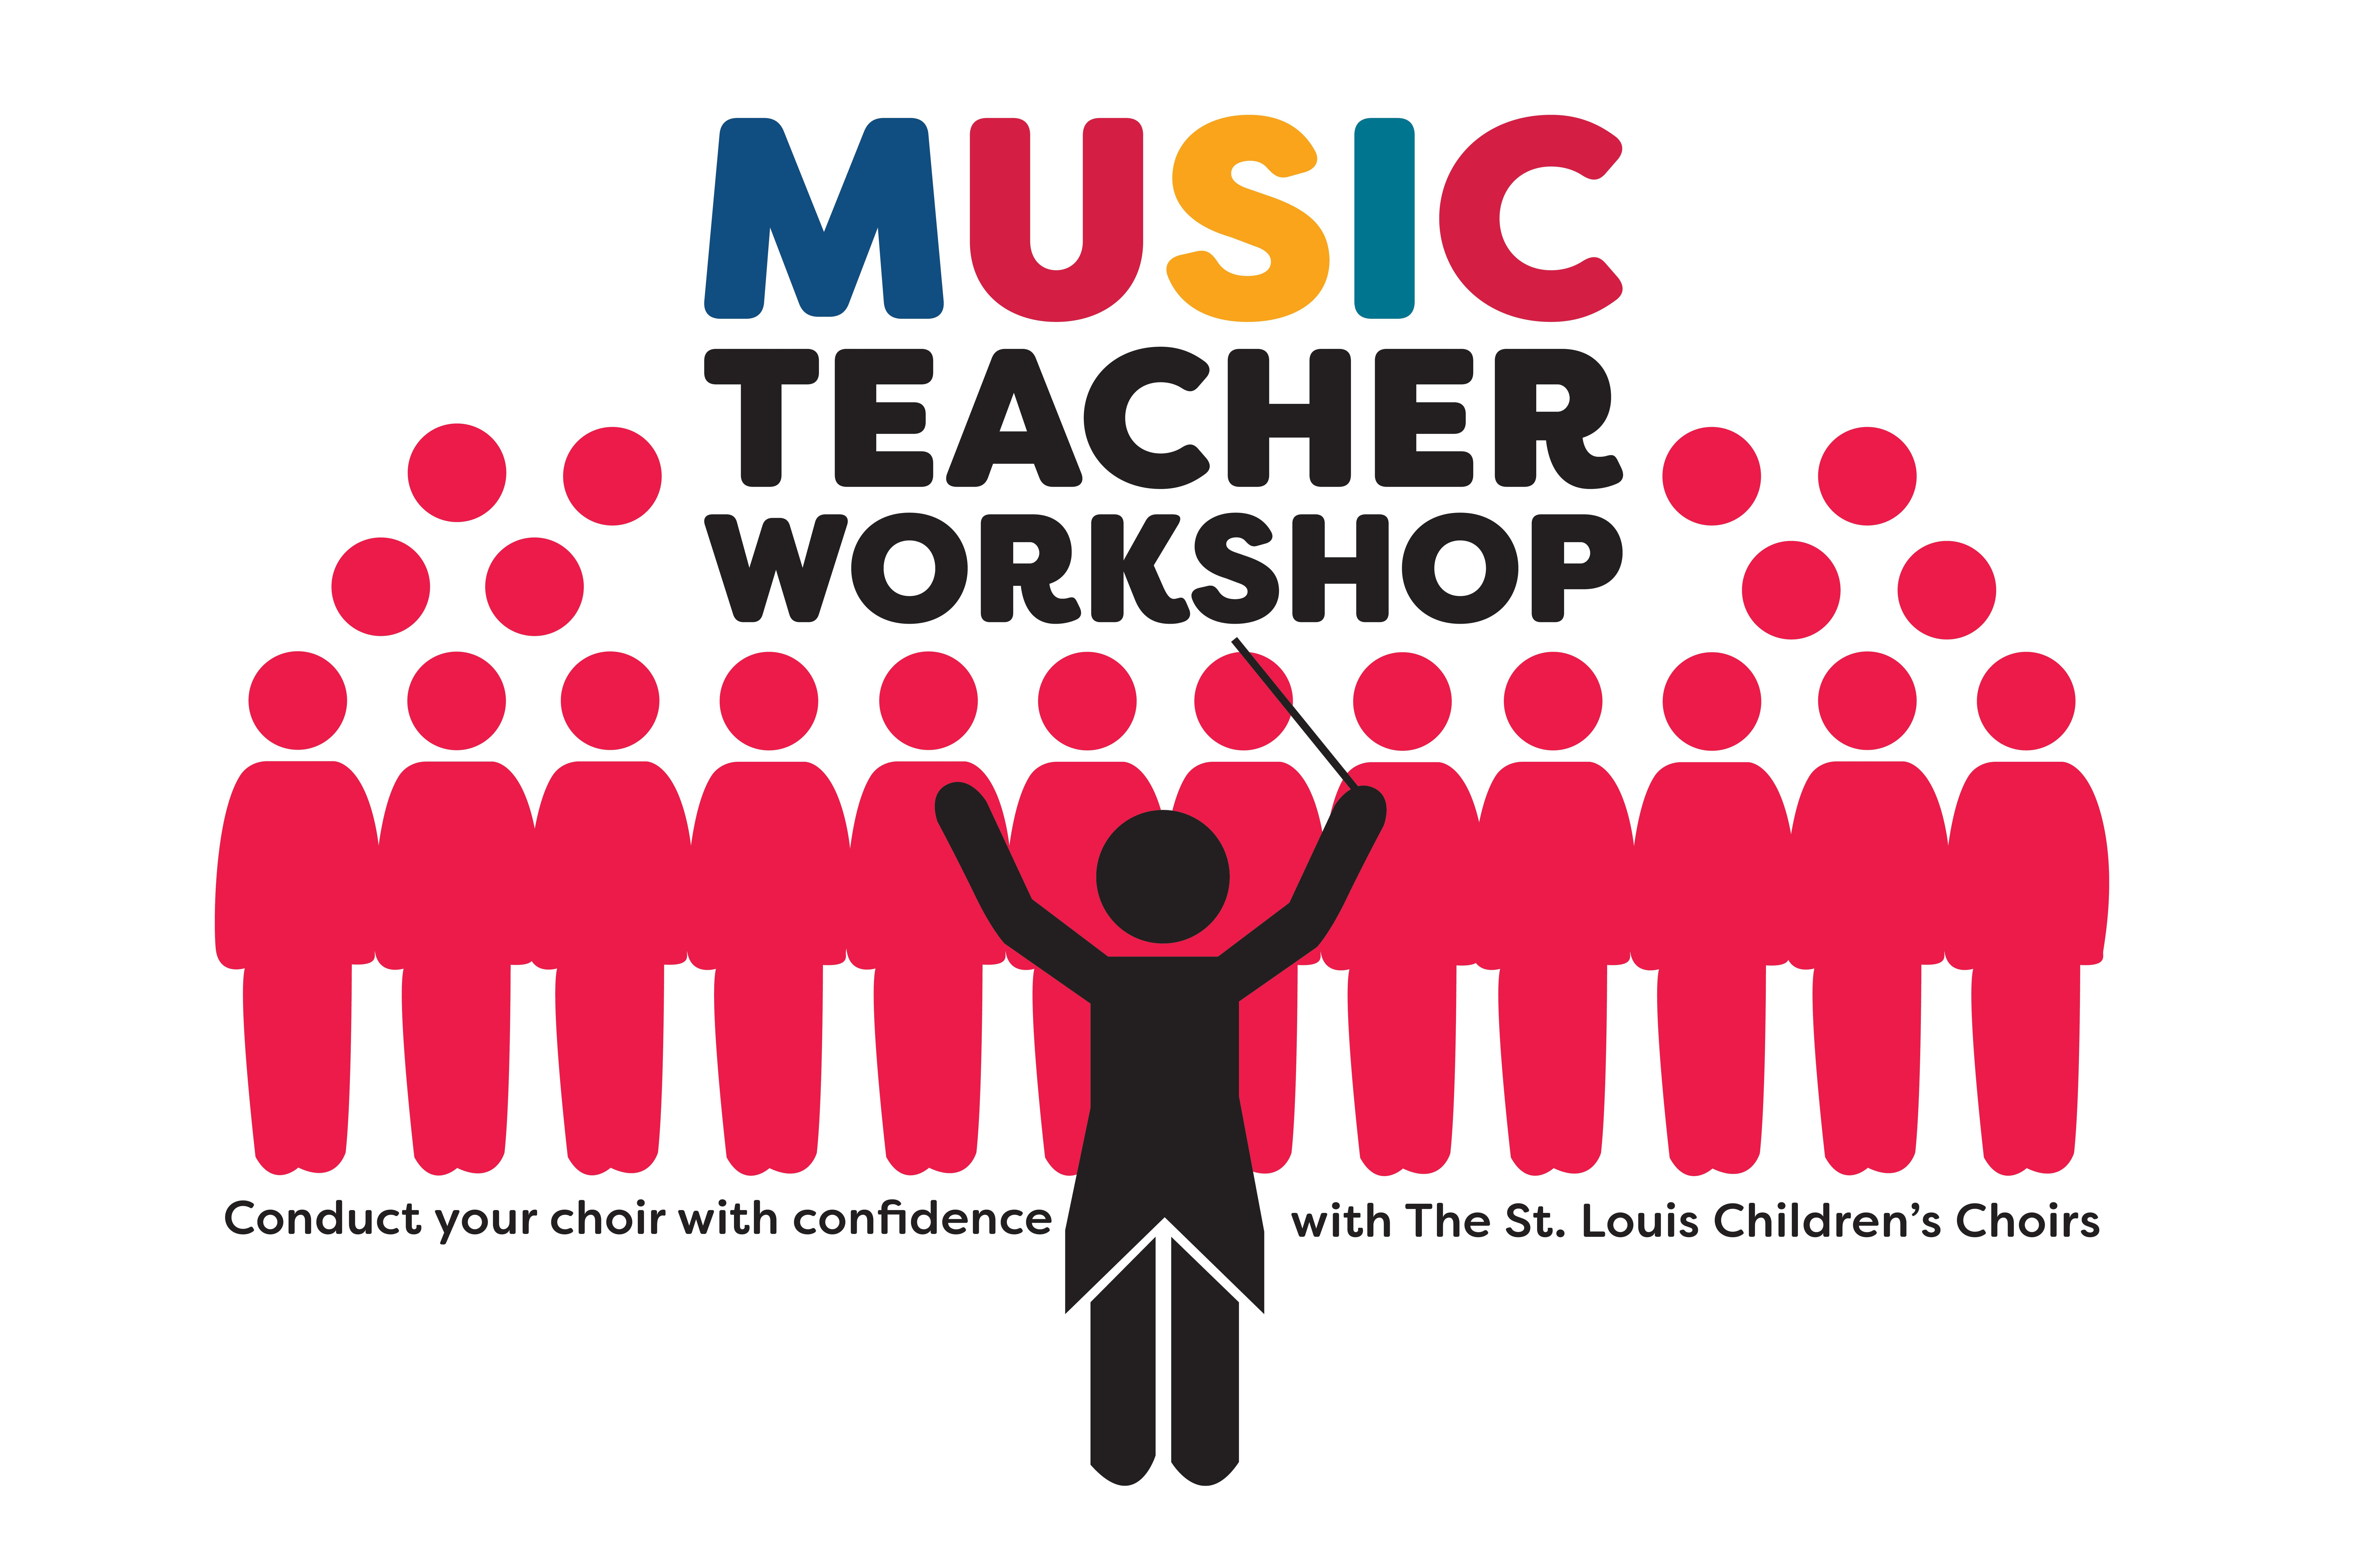 Music Teacher Workshop